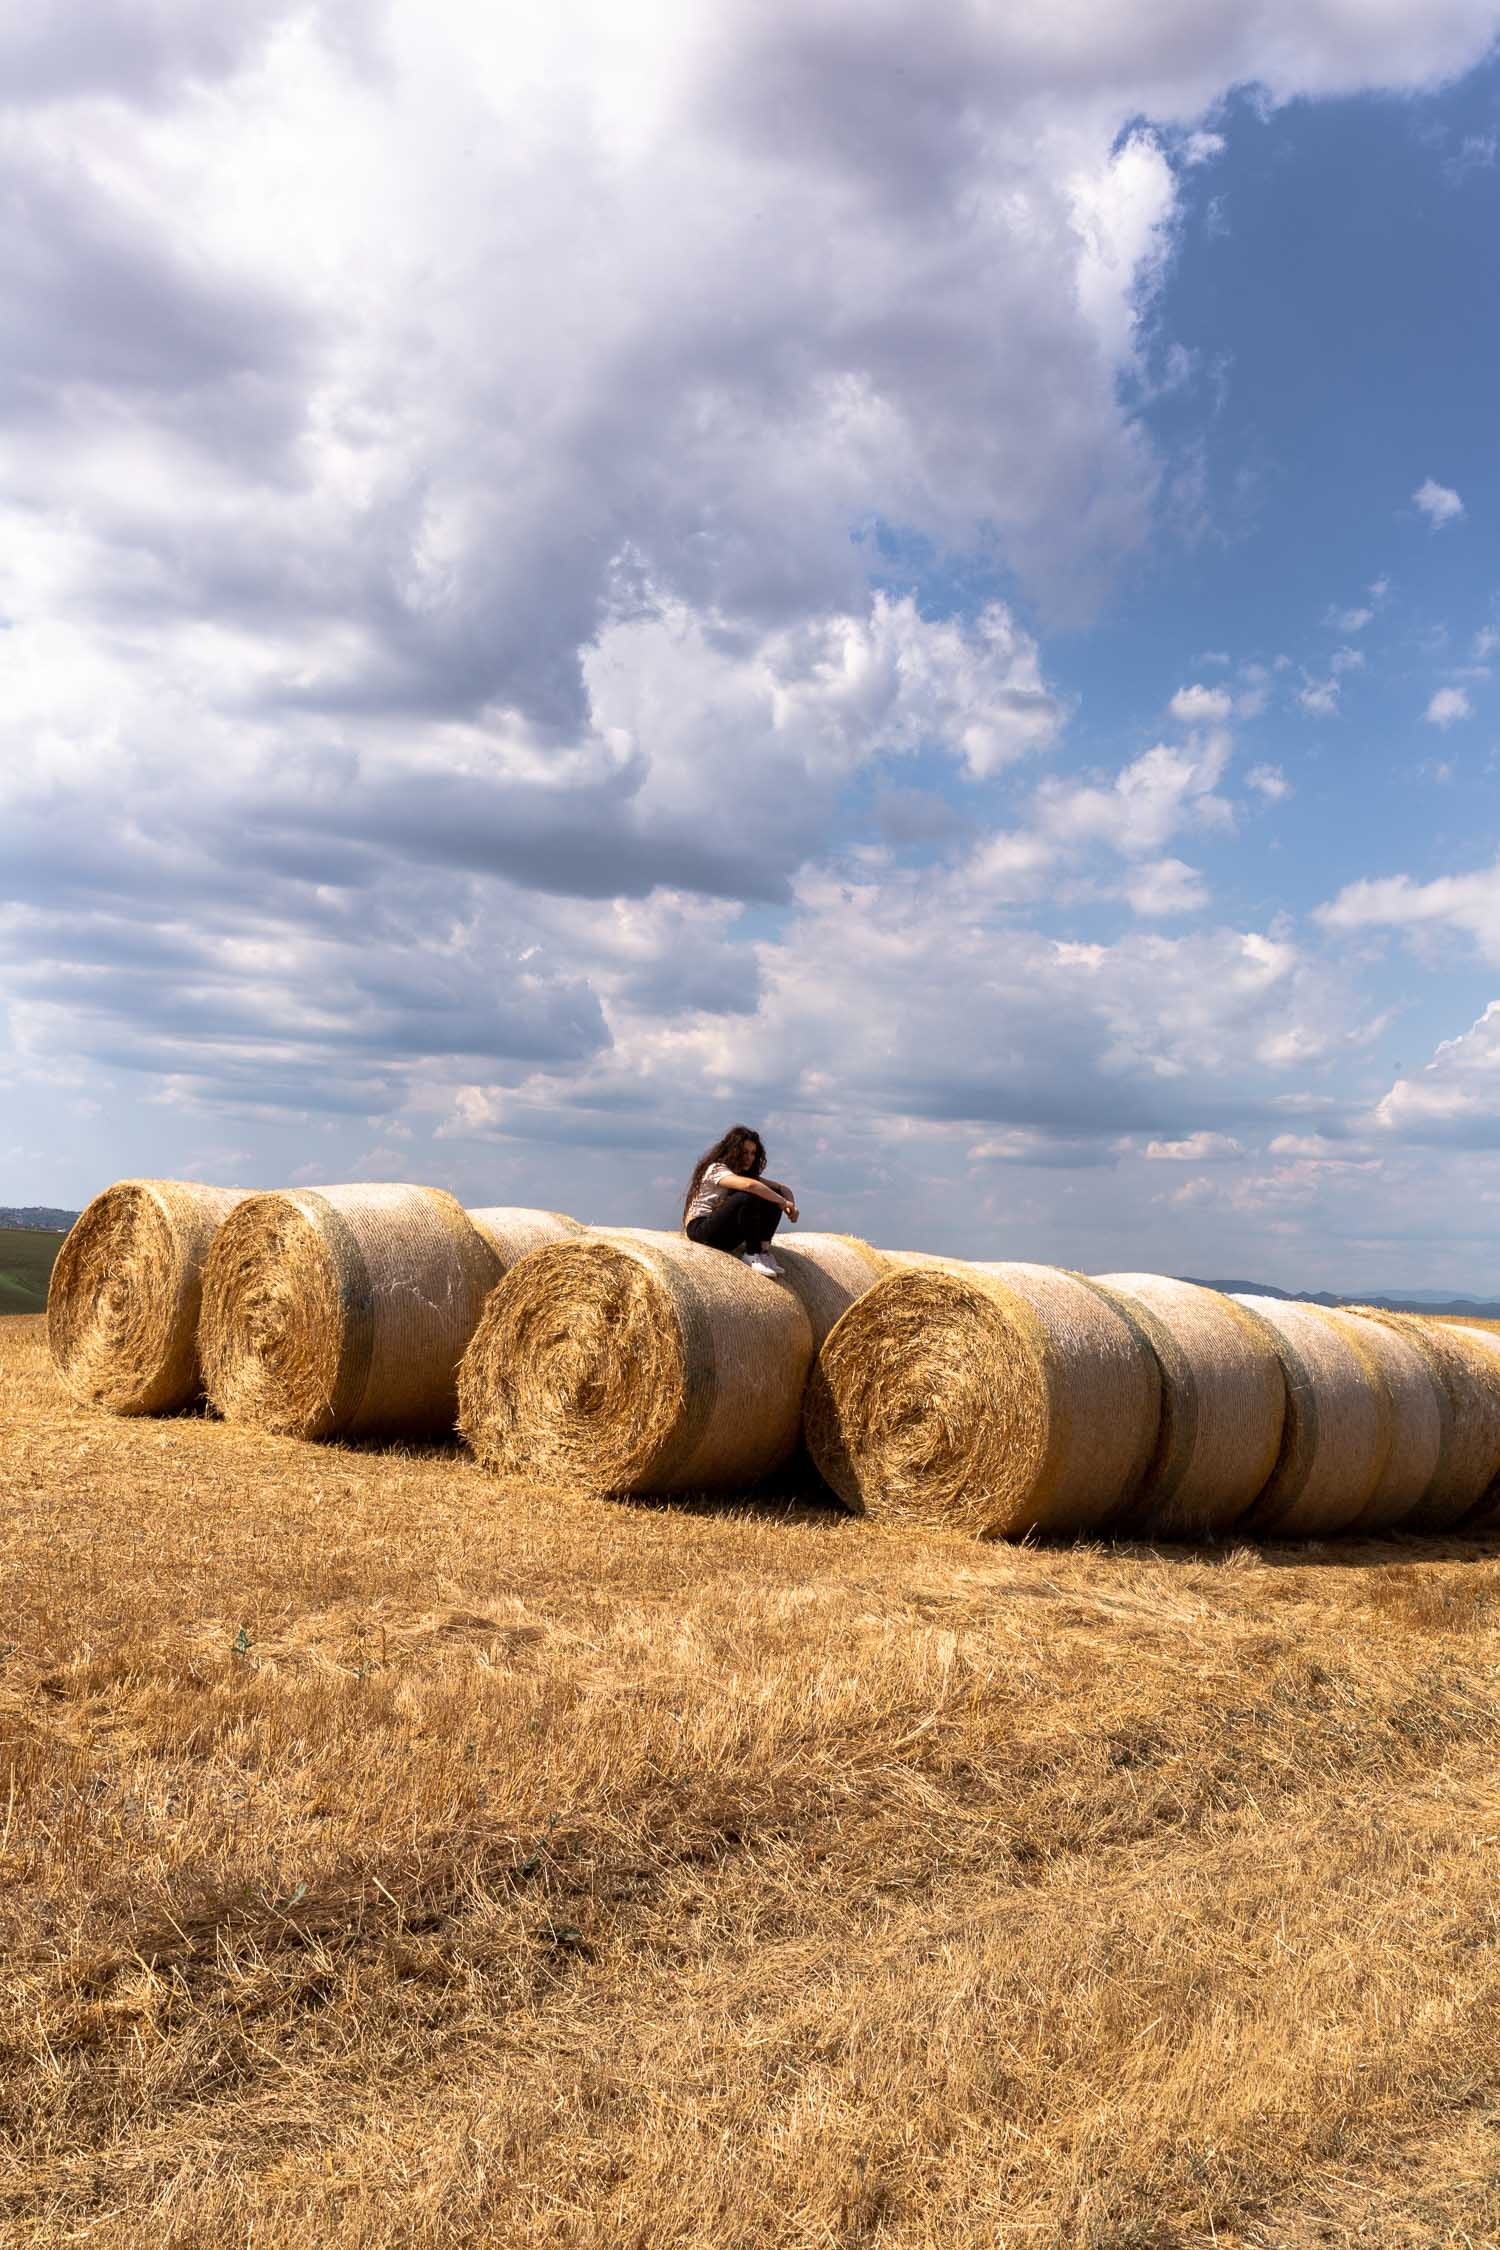 Tuscany-hay-stacks-with-girl-4926.jpg